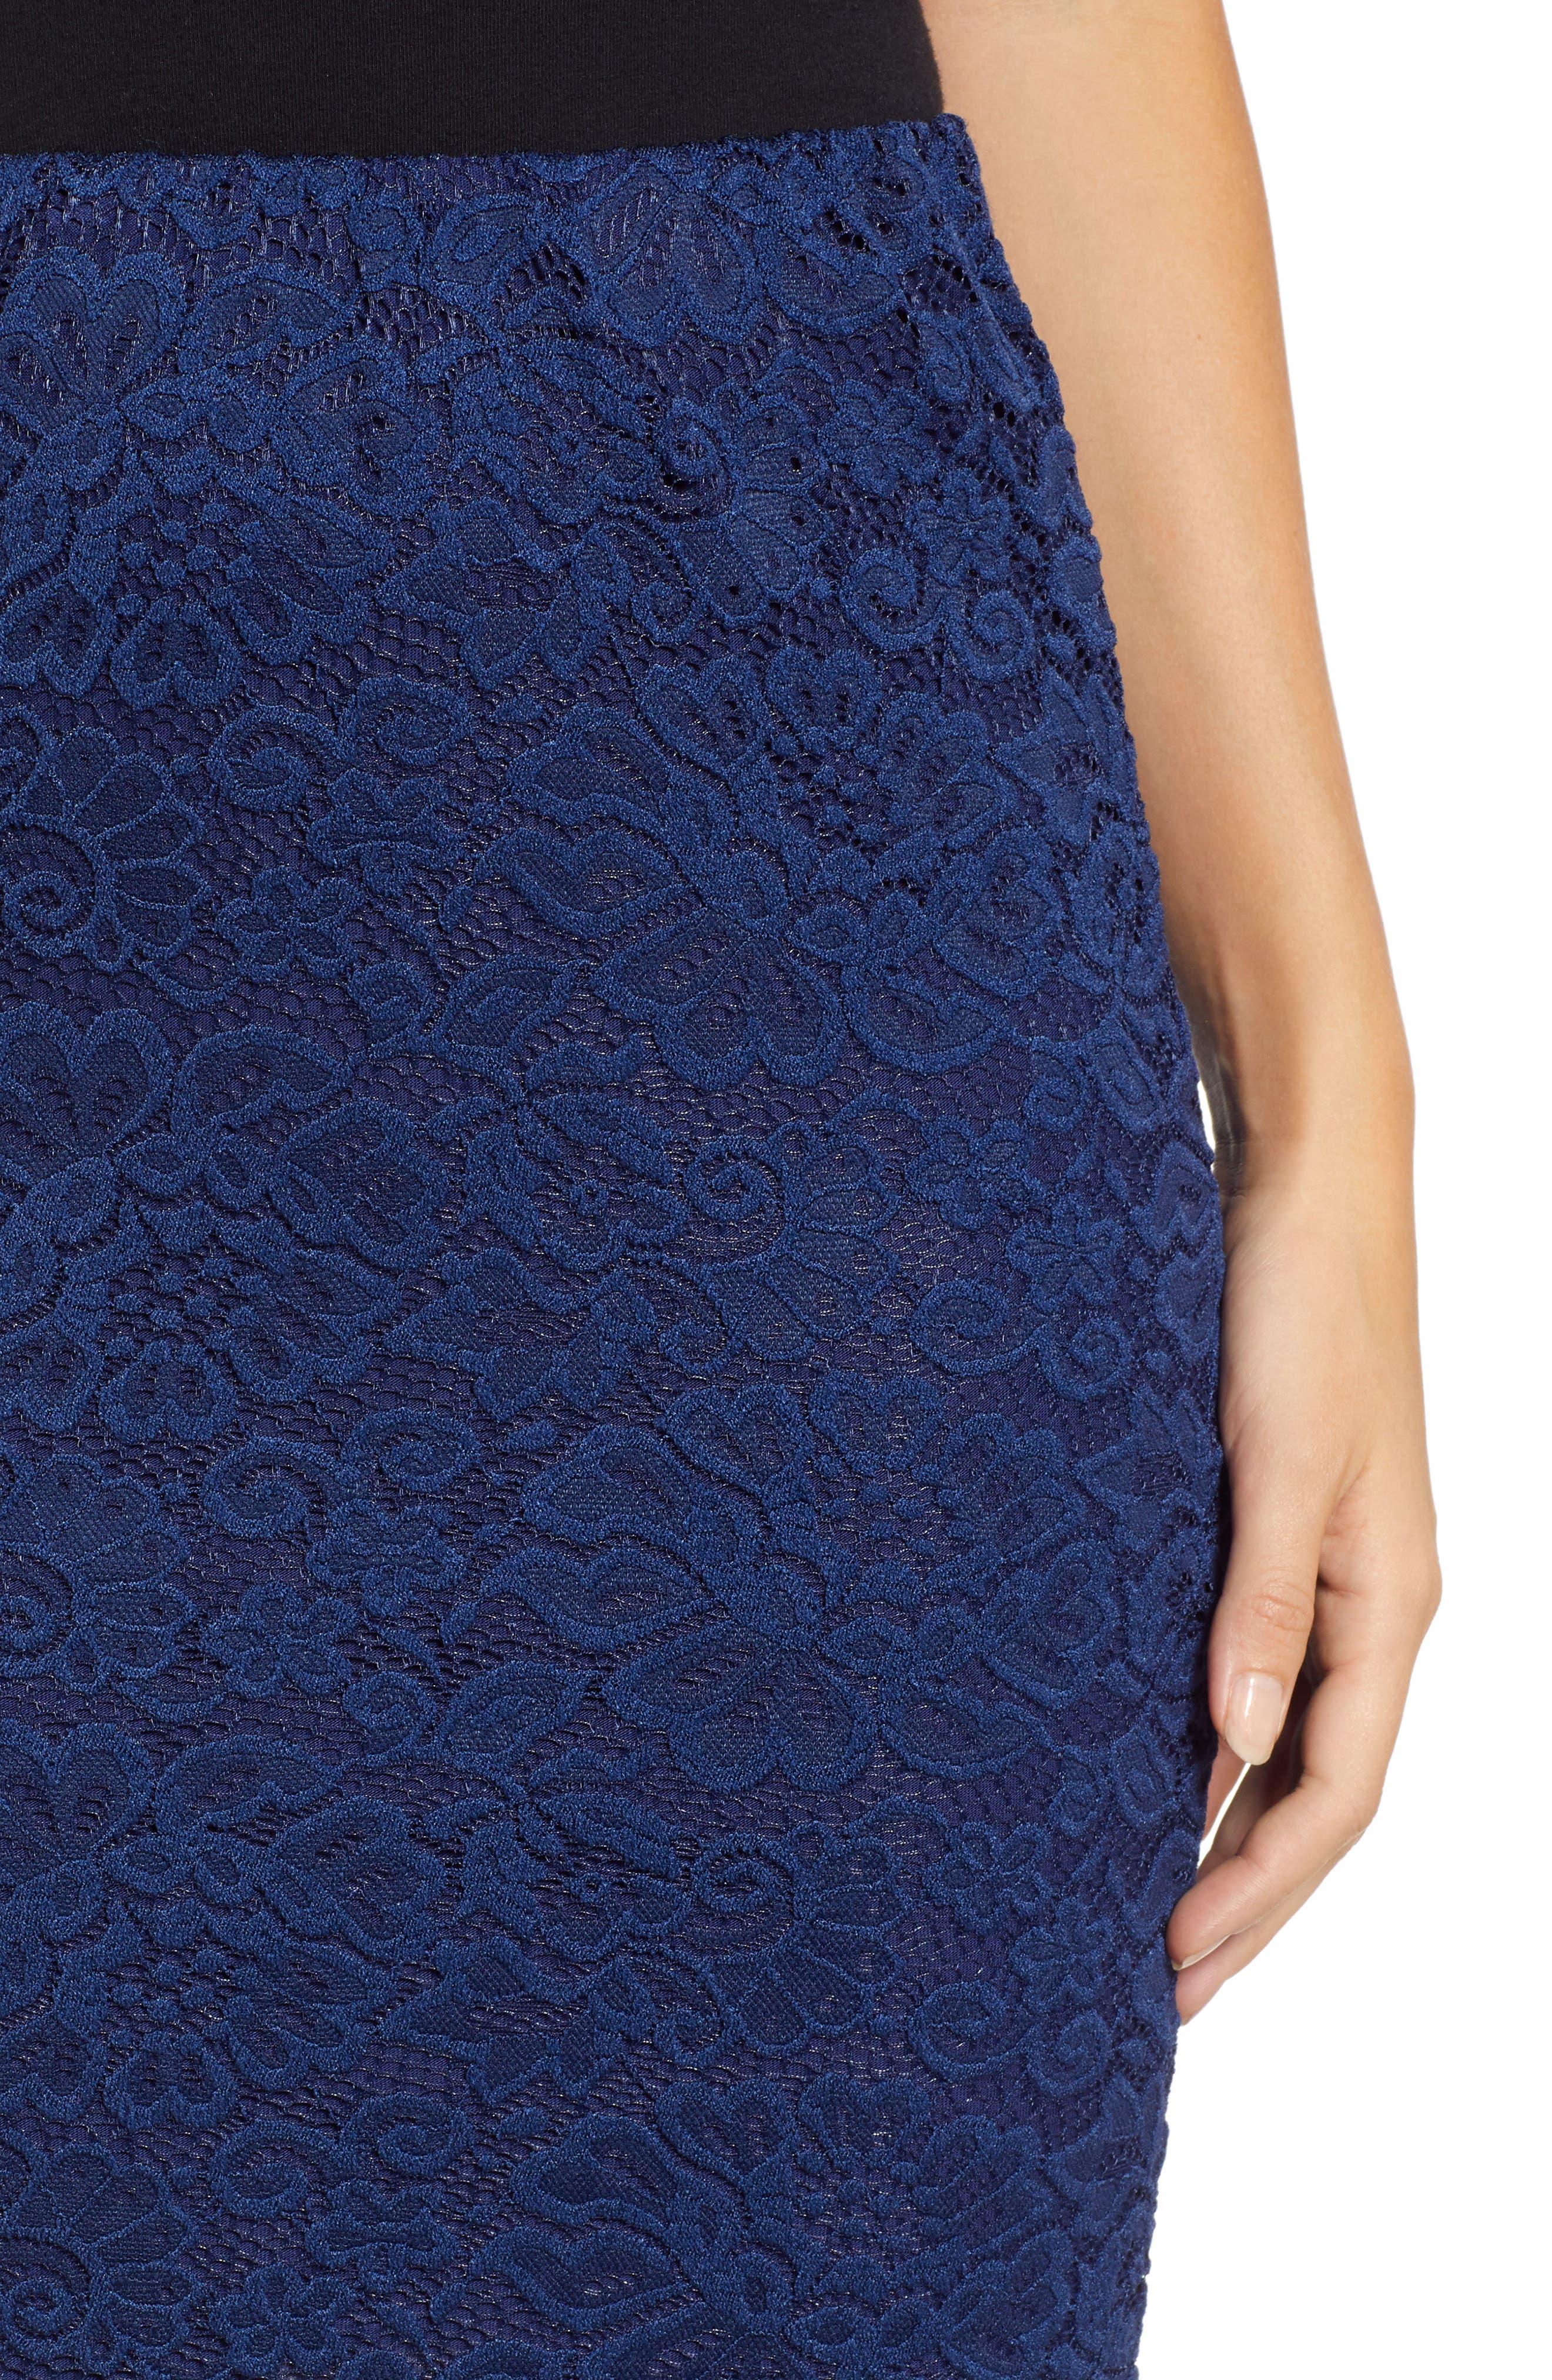 ROSEMUNDE, Filippa Scalloped Lace Skirt, Alternate thumbnail 4, color, NAVY PEONY